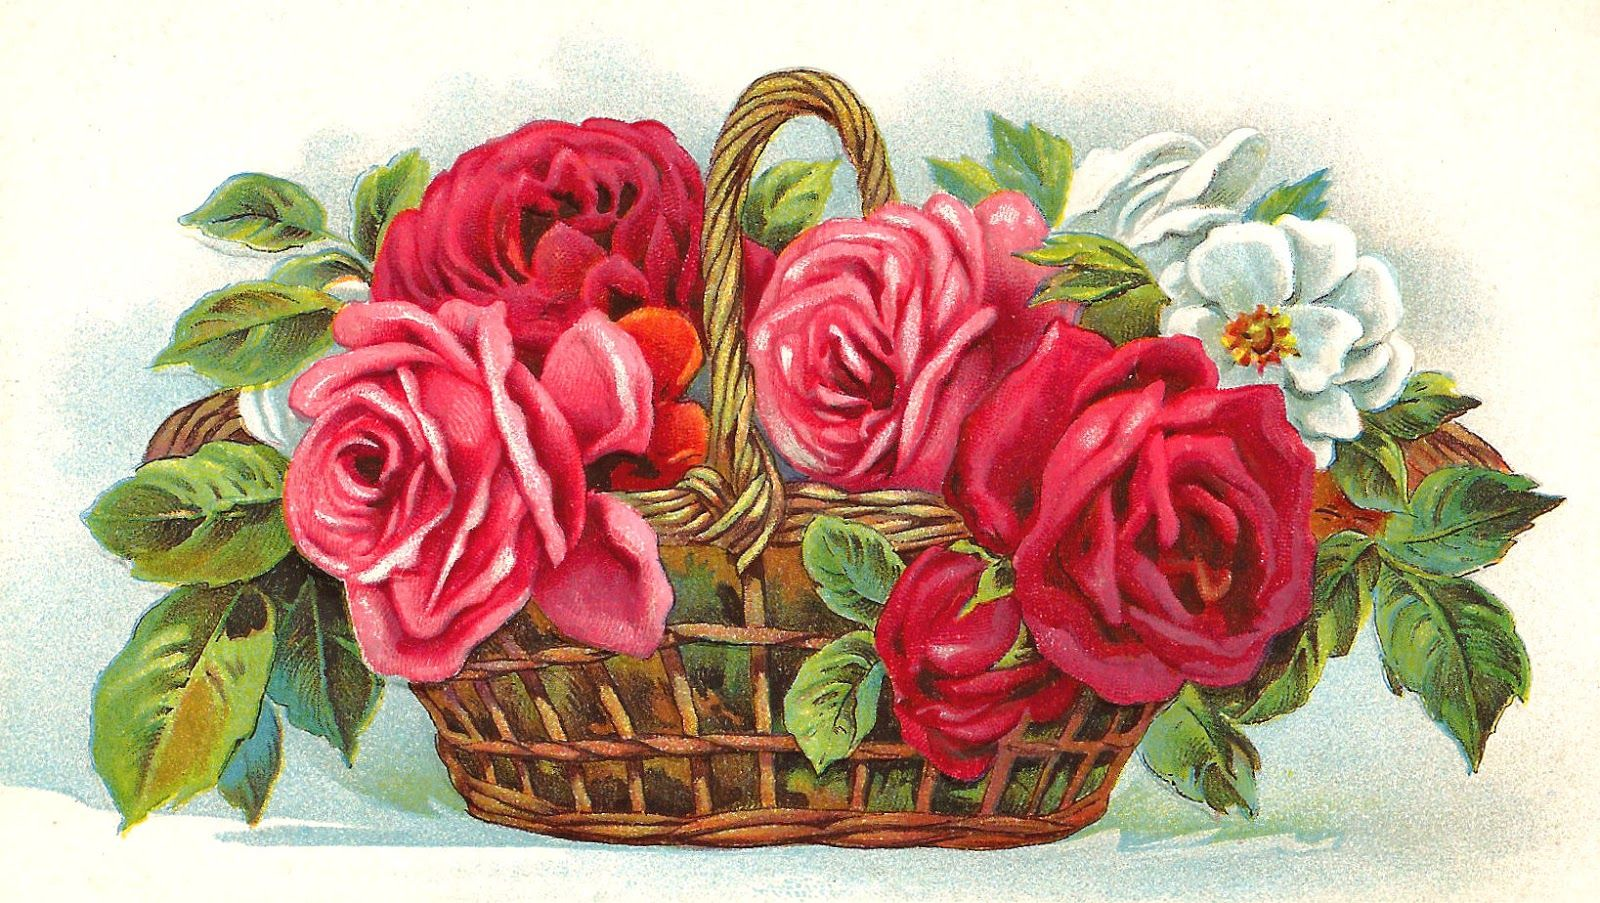 Free rose clip art free red rose clip art flower basket full of free rose clip art free red rose clip art flower basket full of red pink and white izmirmasajfo